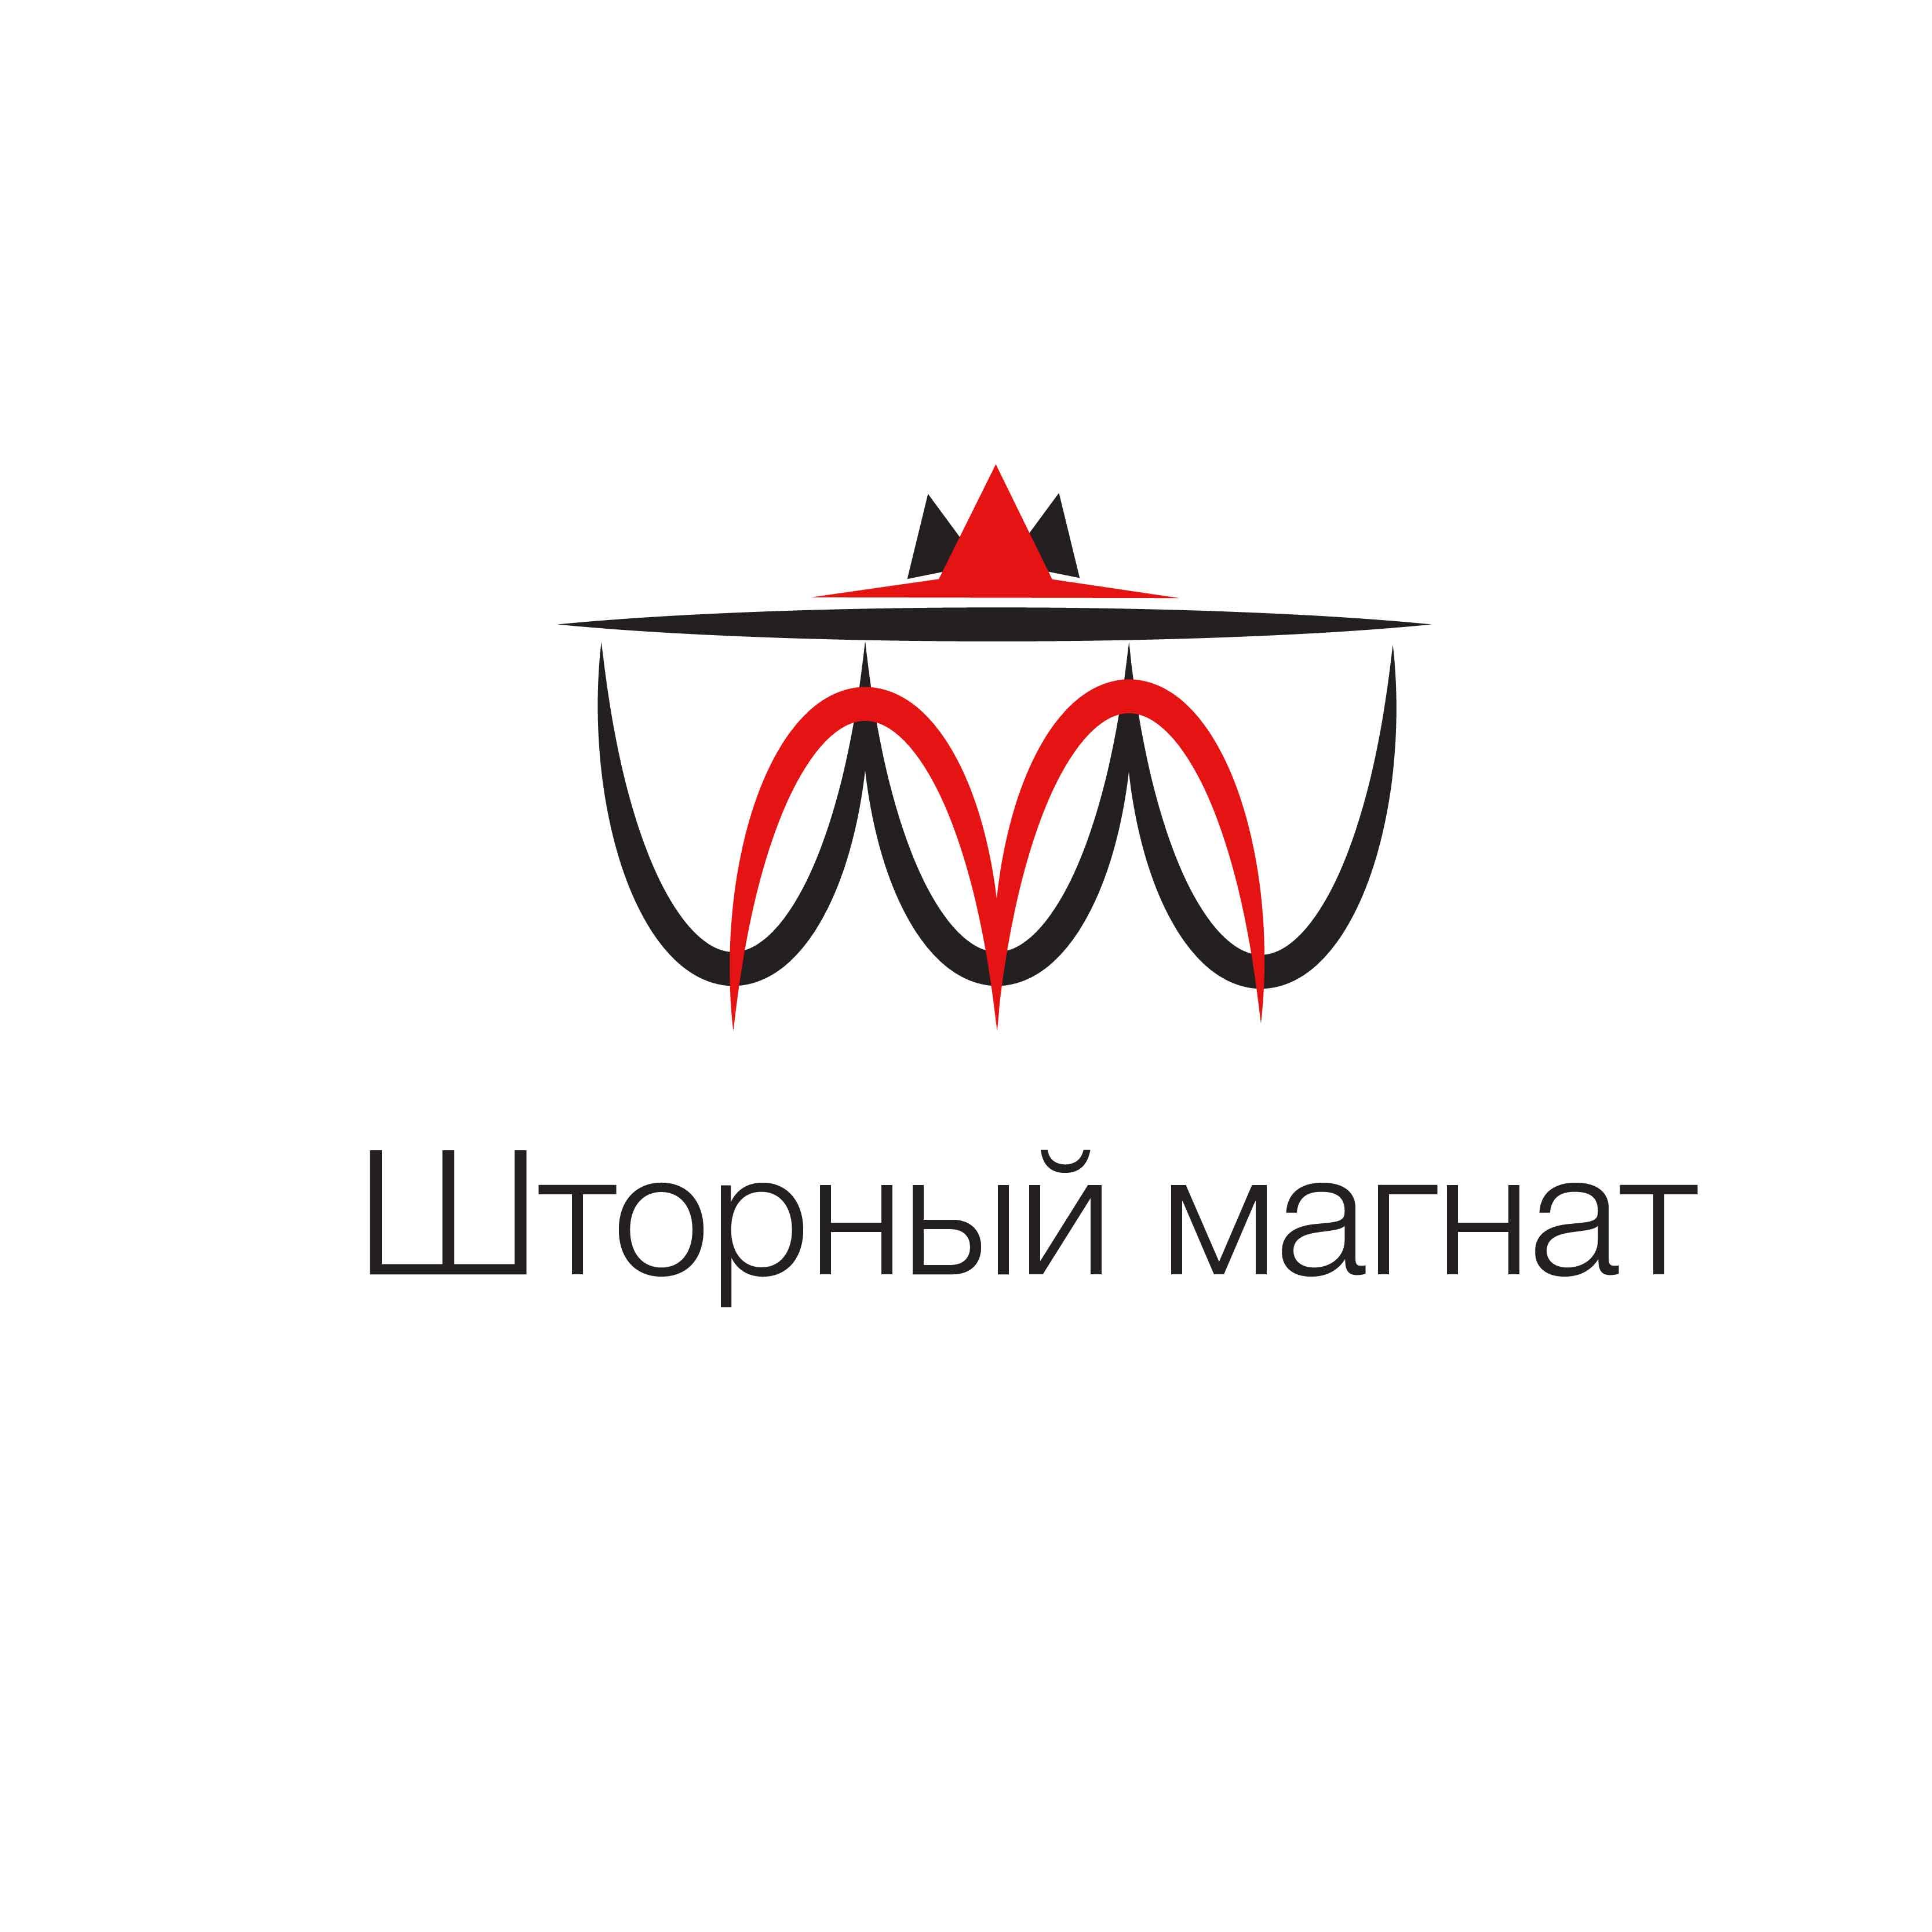 Логотип и фирменный стиль для магазина тканей. фото f_0675cdc14e1d22b7.jpg